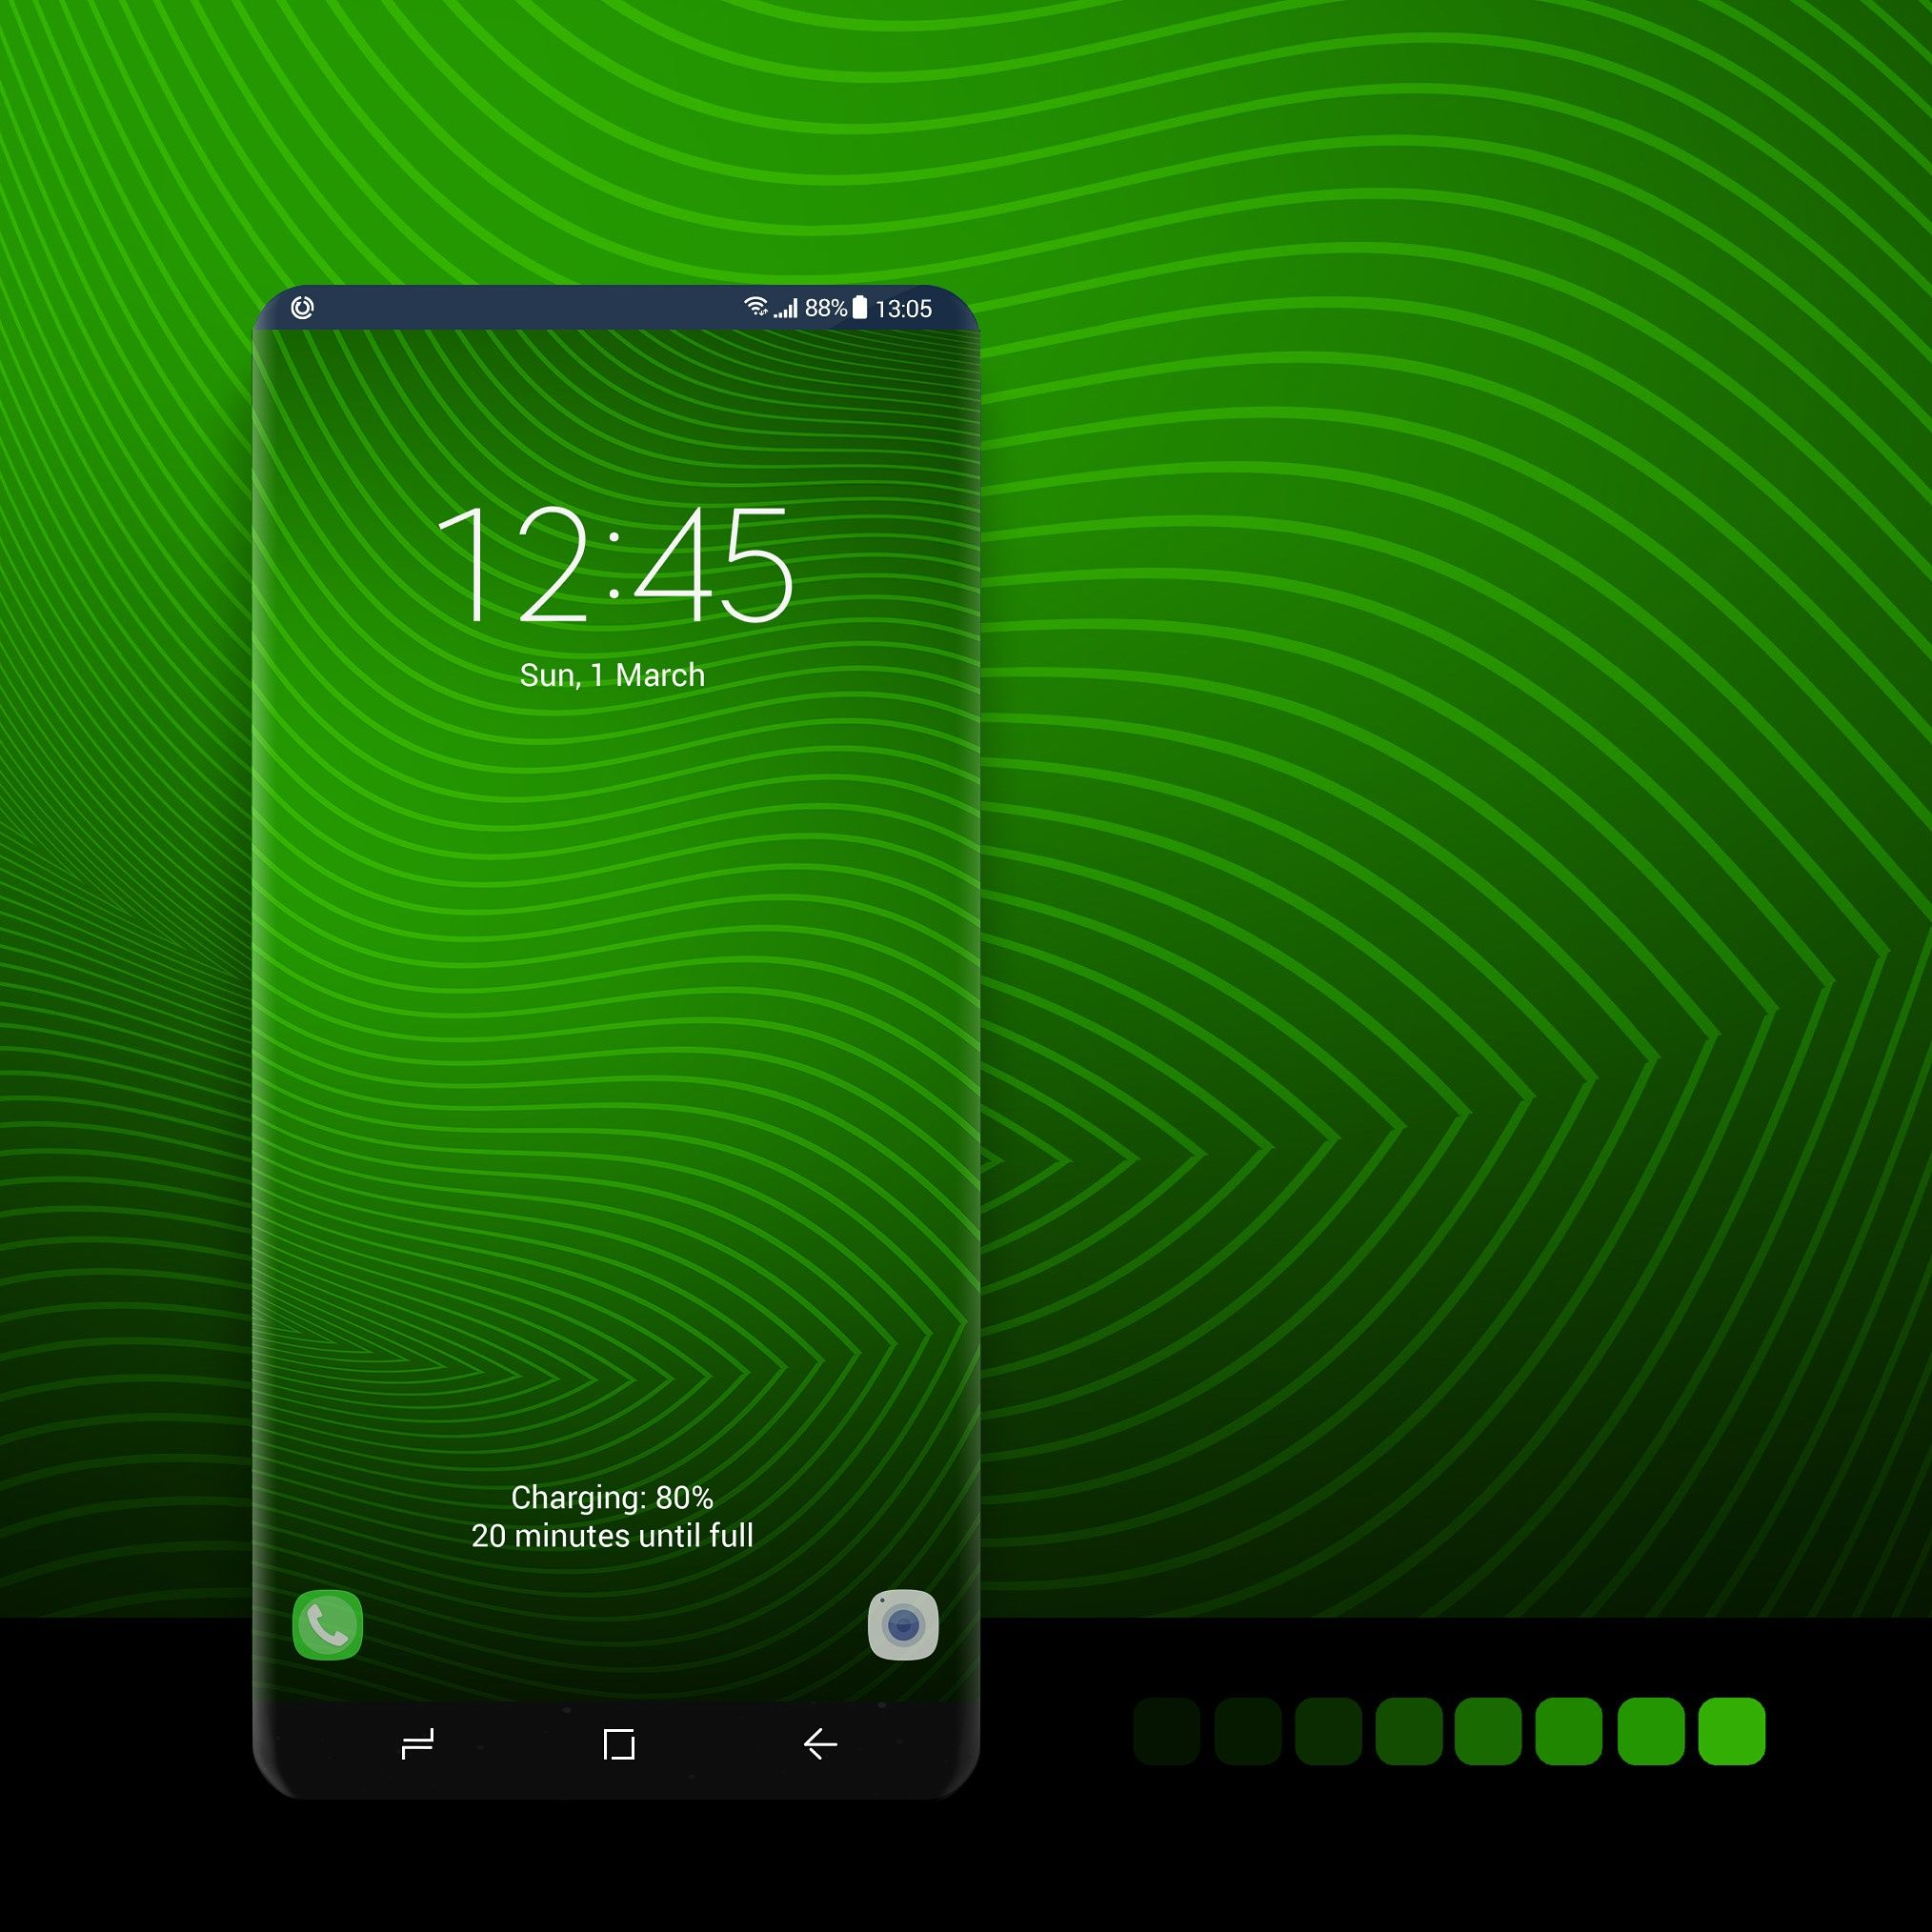 Green Wavy Lines Samsung Wallpaper Samsung Galaxy Samsung Galaxy Wallpaper